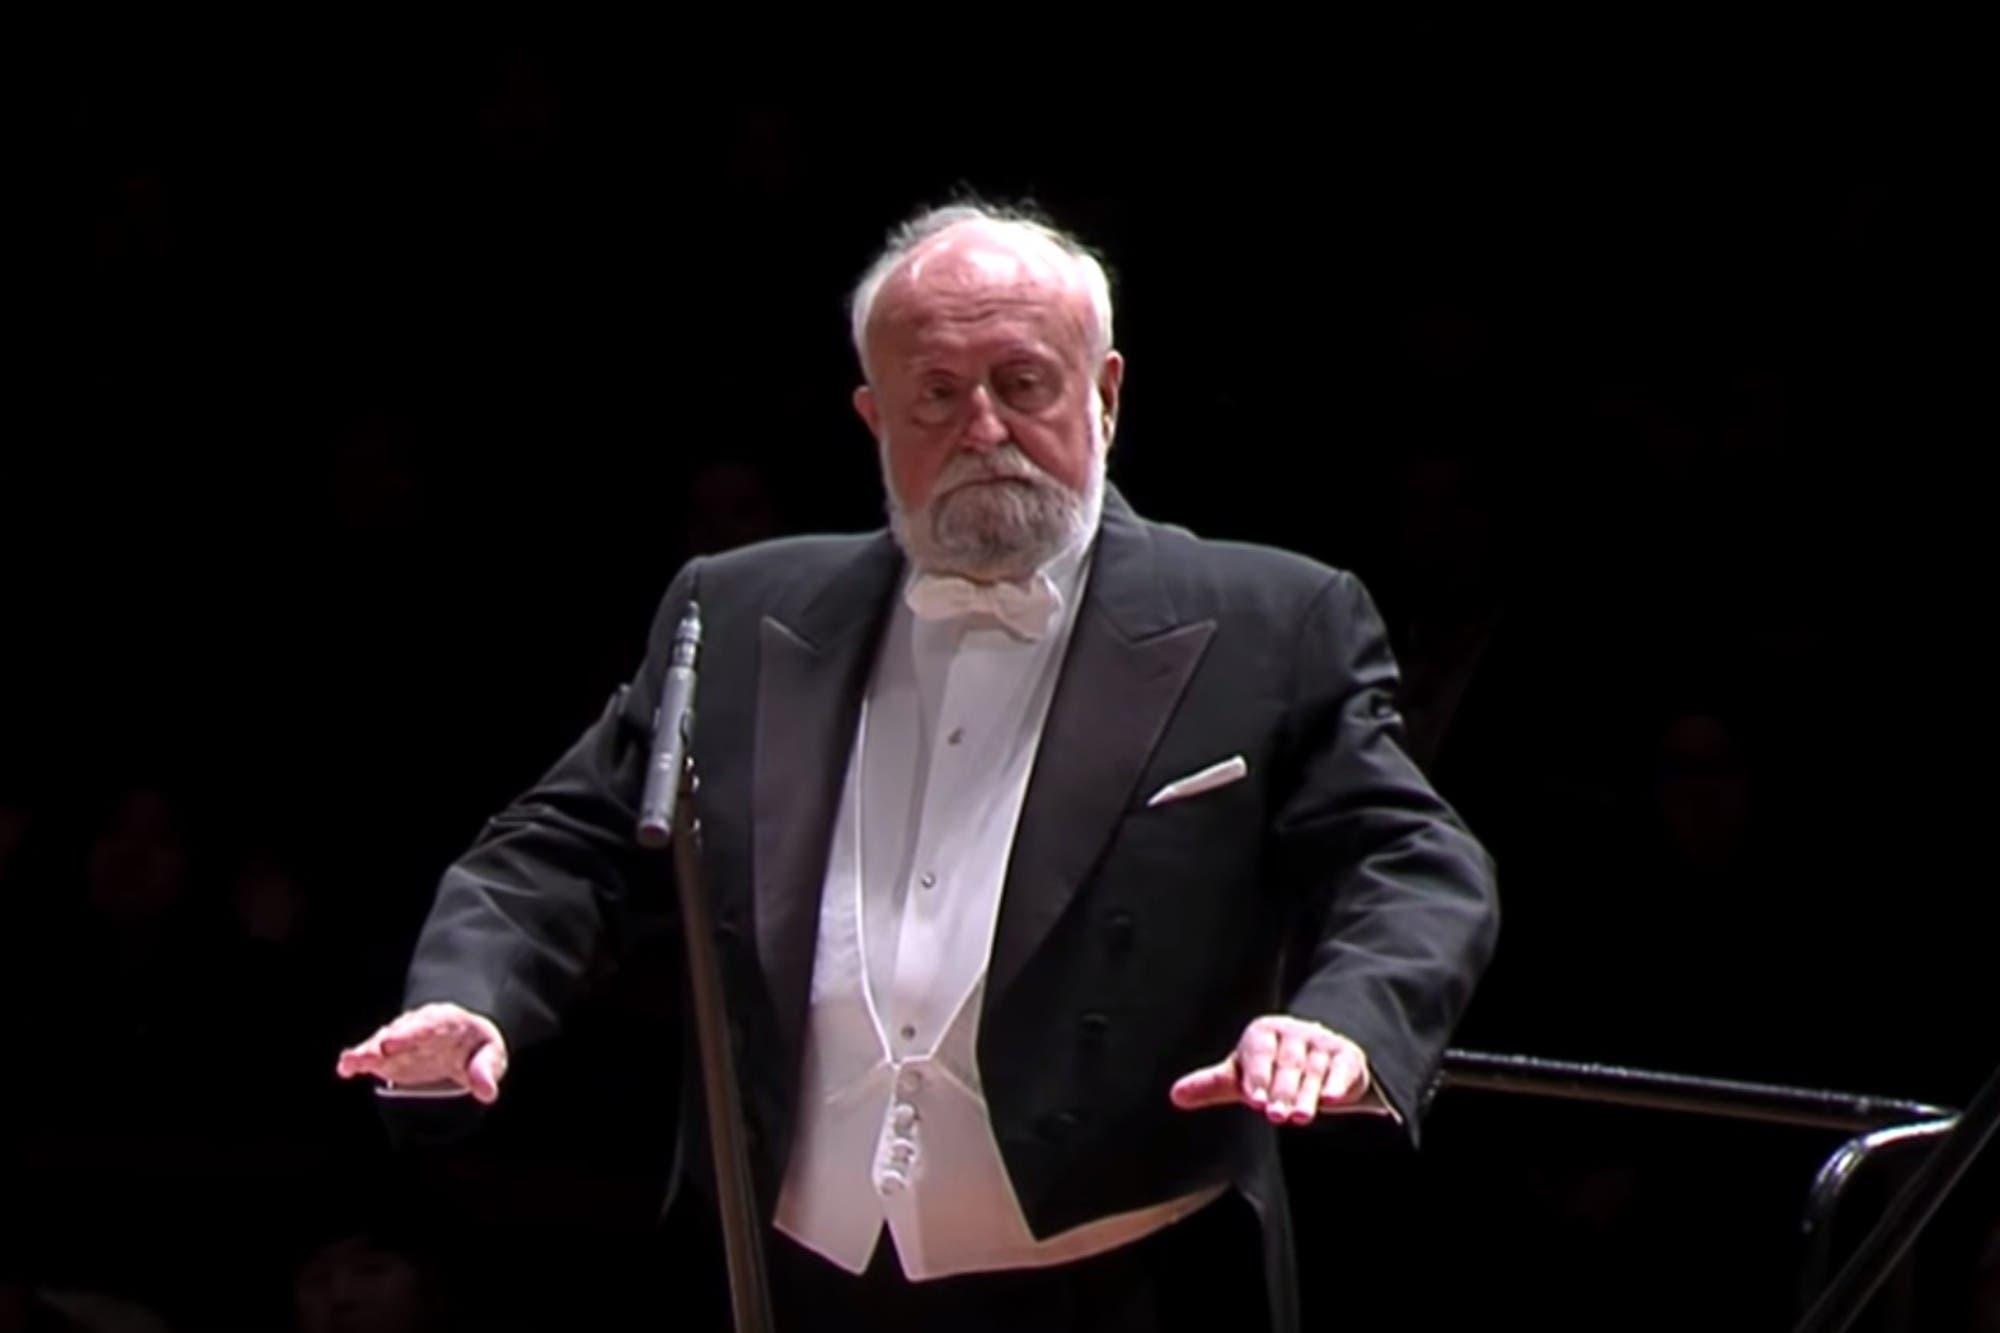 Murió el gran compositor polaco Krzysztof Penderecki